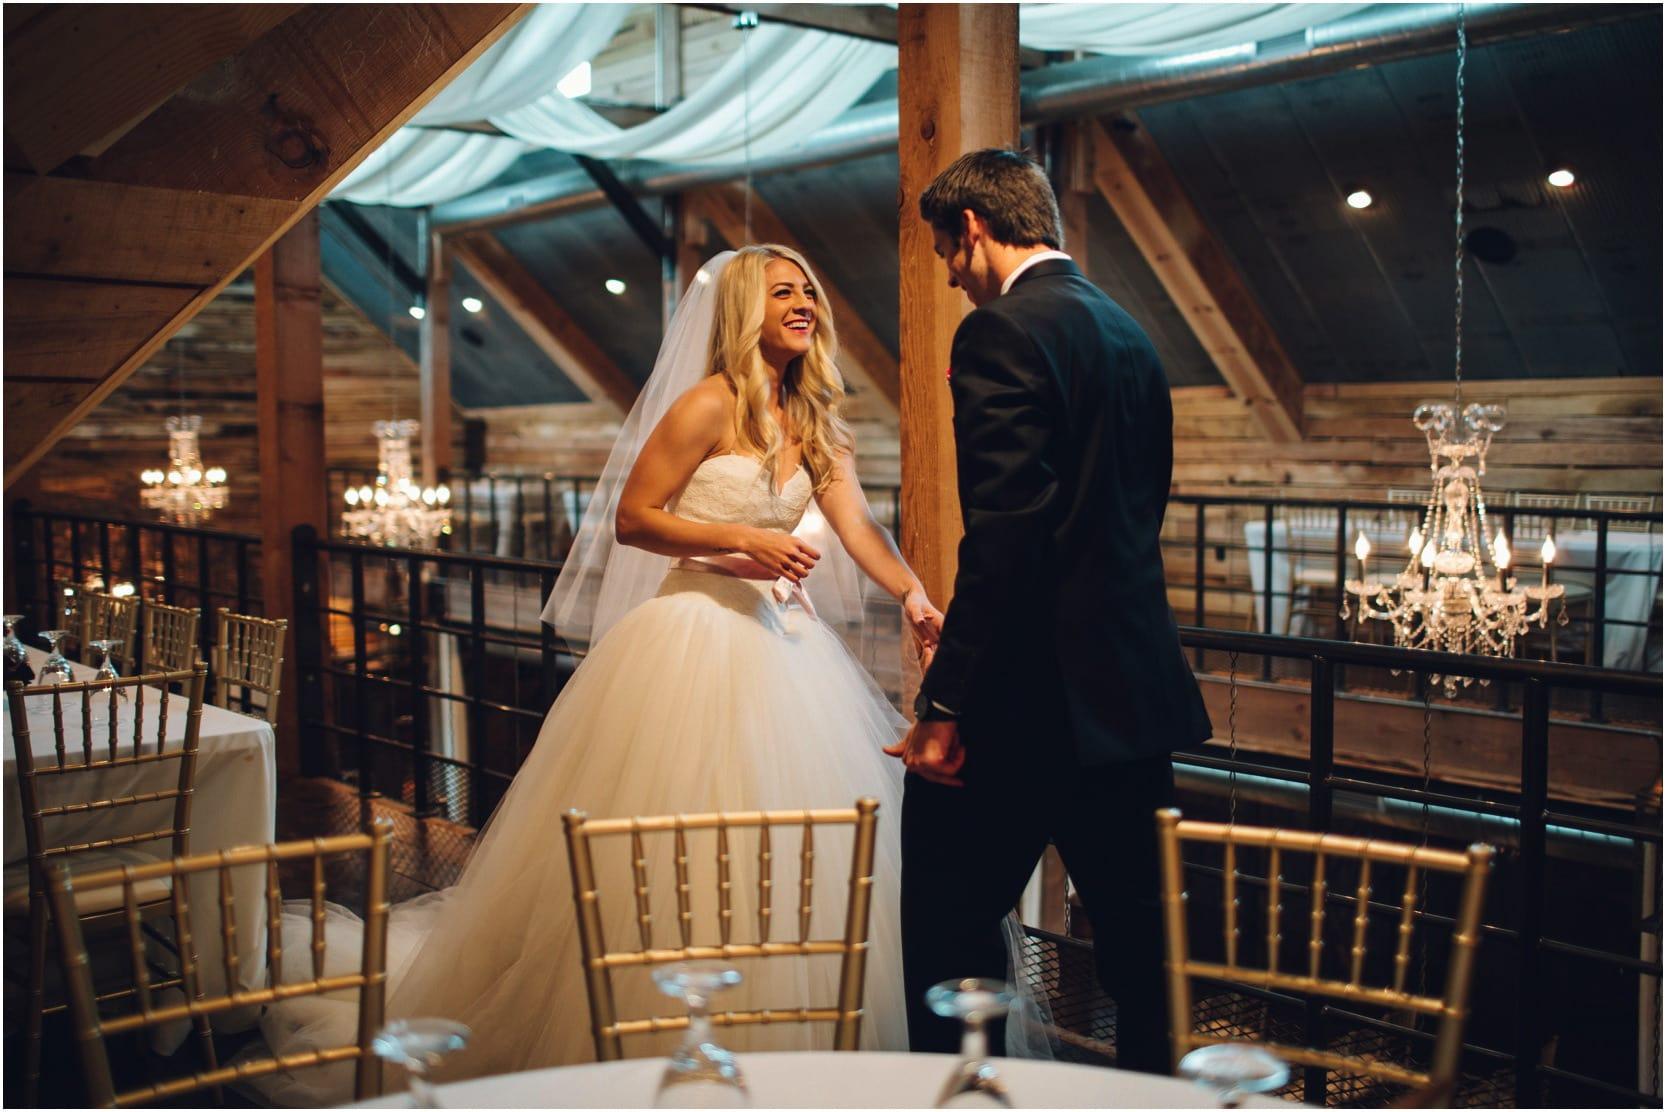 coderhillengburg_oklahoma_wedding__411_blogstomped